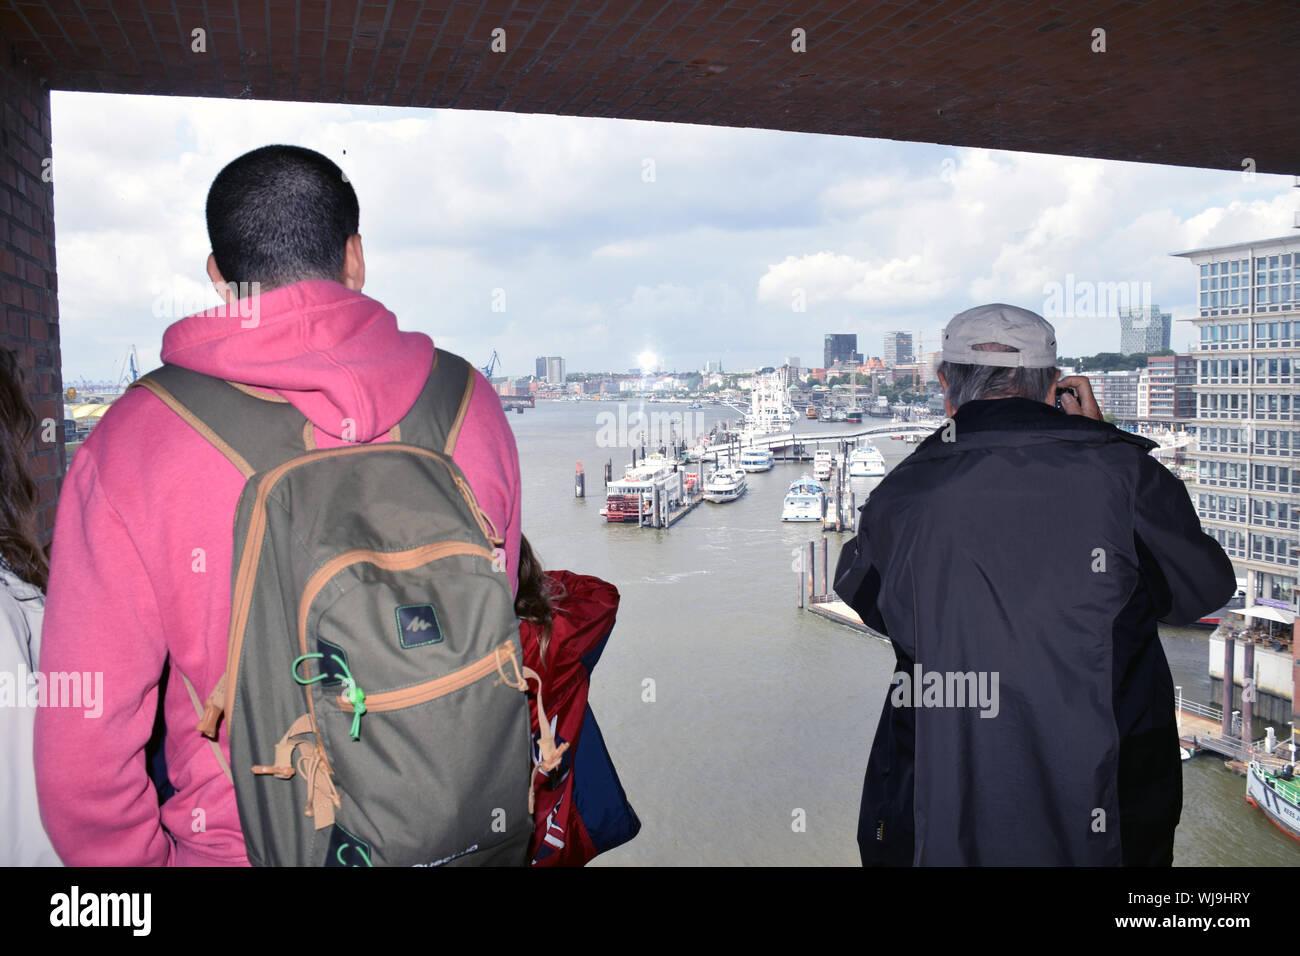 Viewing platform on the new Elbphilharmonie Hamburg (opera house), Germany Aug 2019 Stock Photo